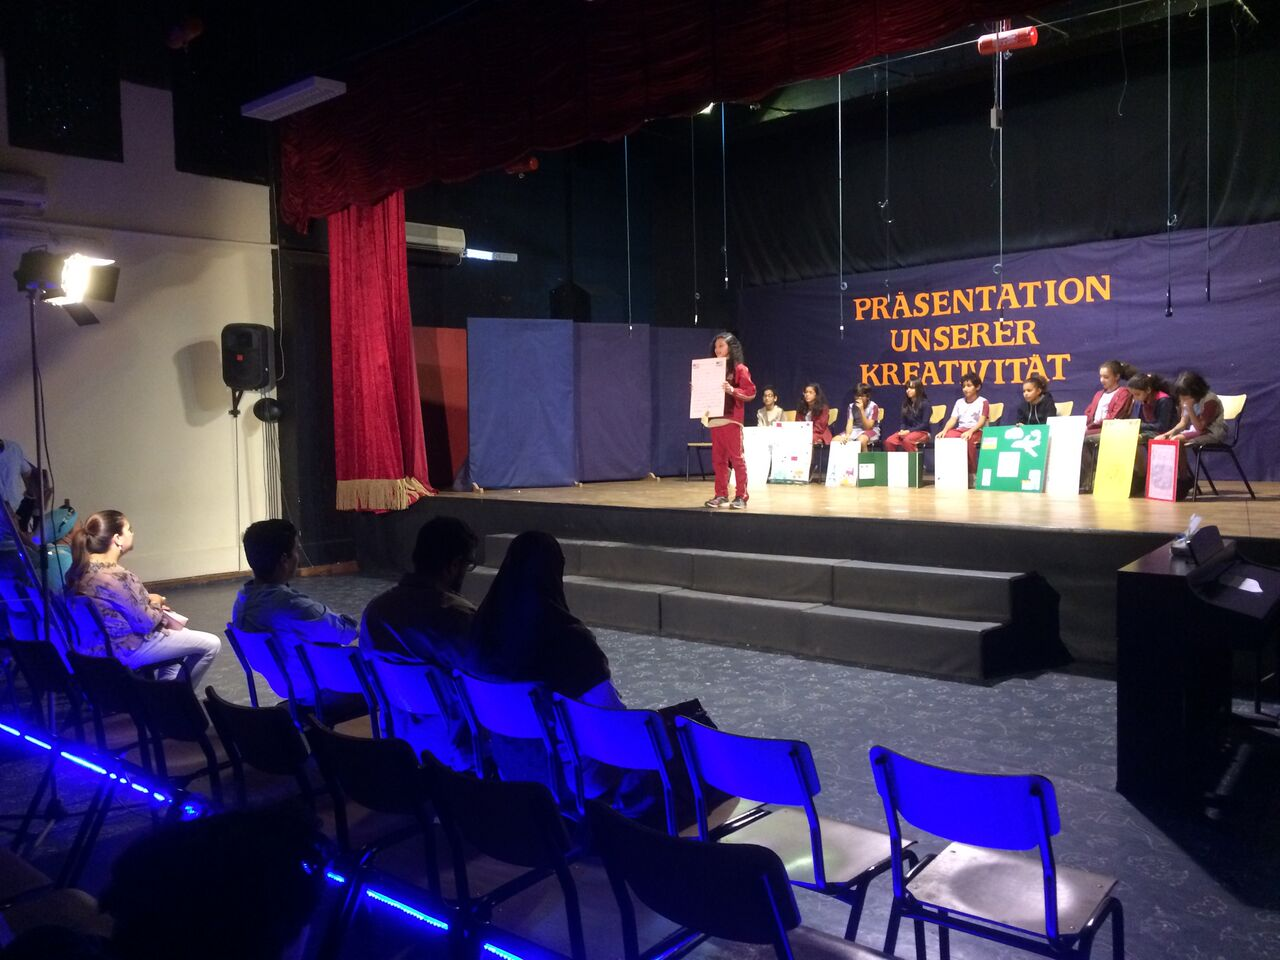 Präsentation unserer Kreativität im Schultheater